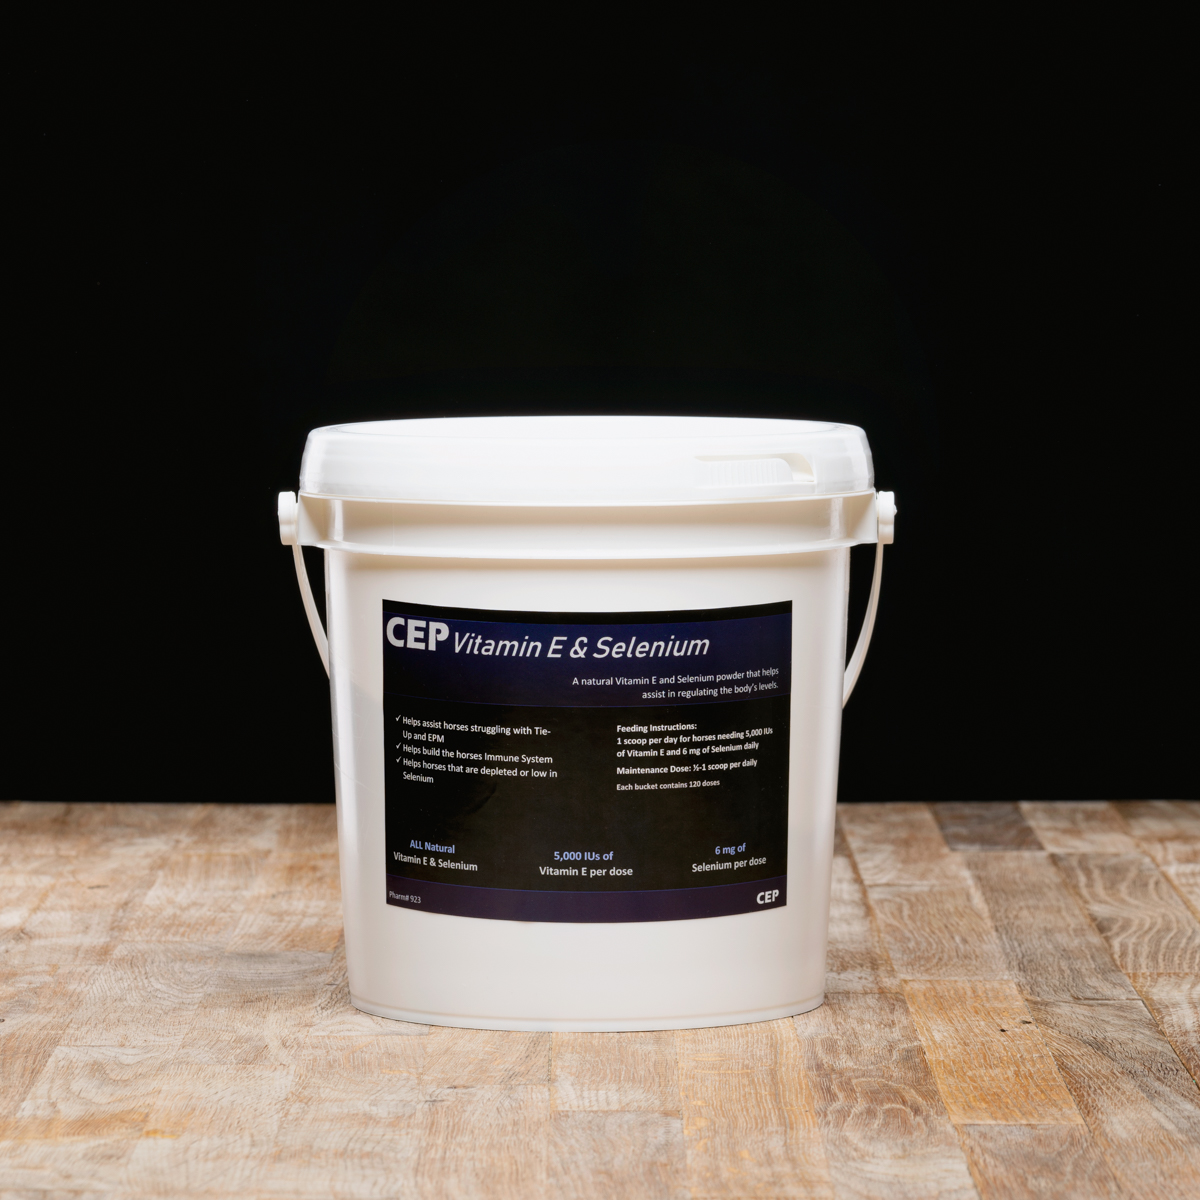 CEP - Vitamin E & Selenium